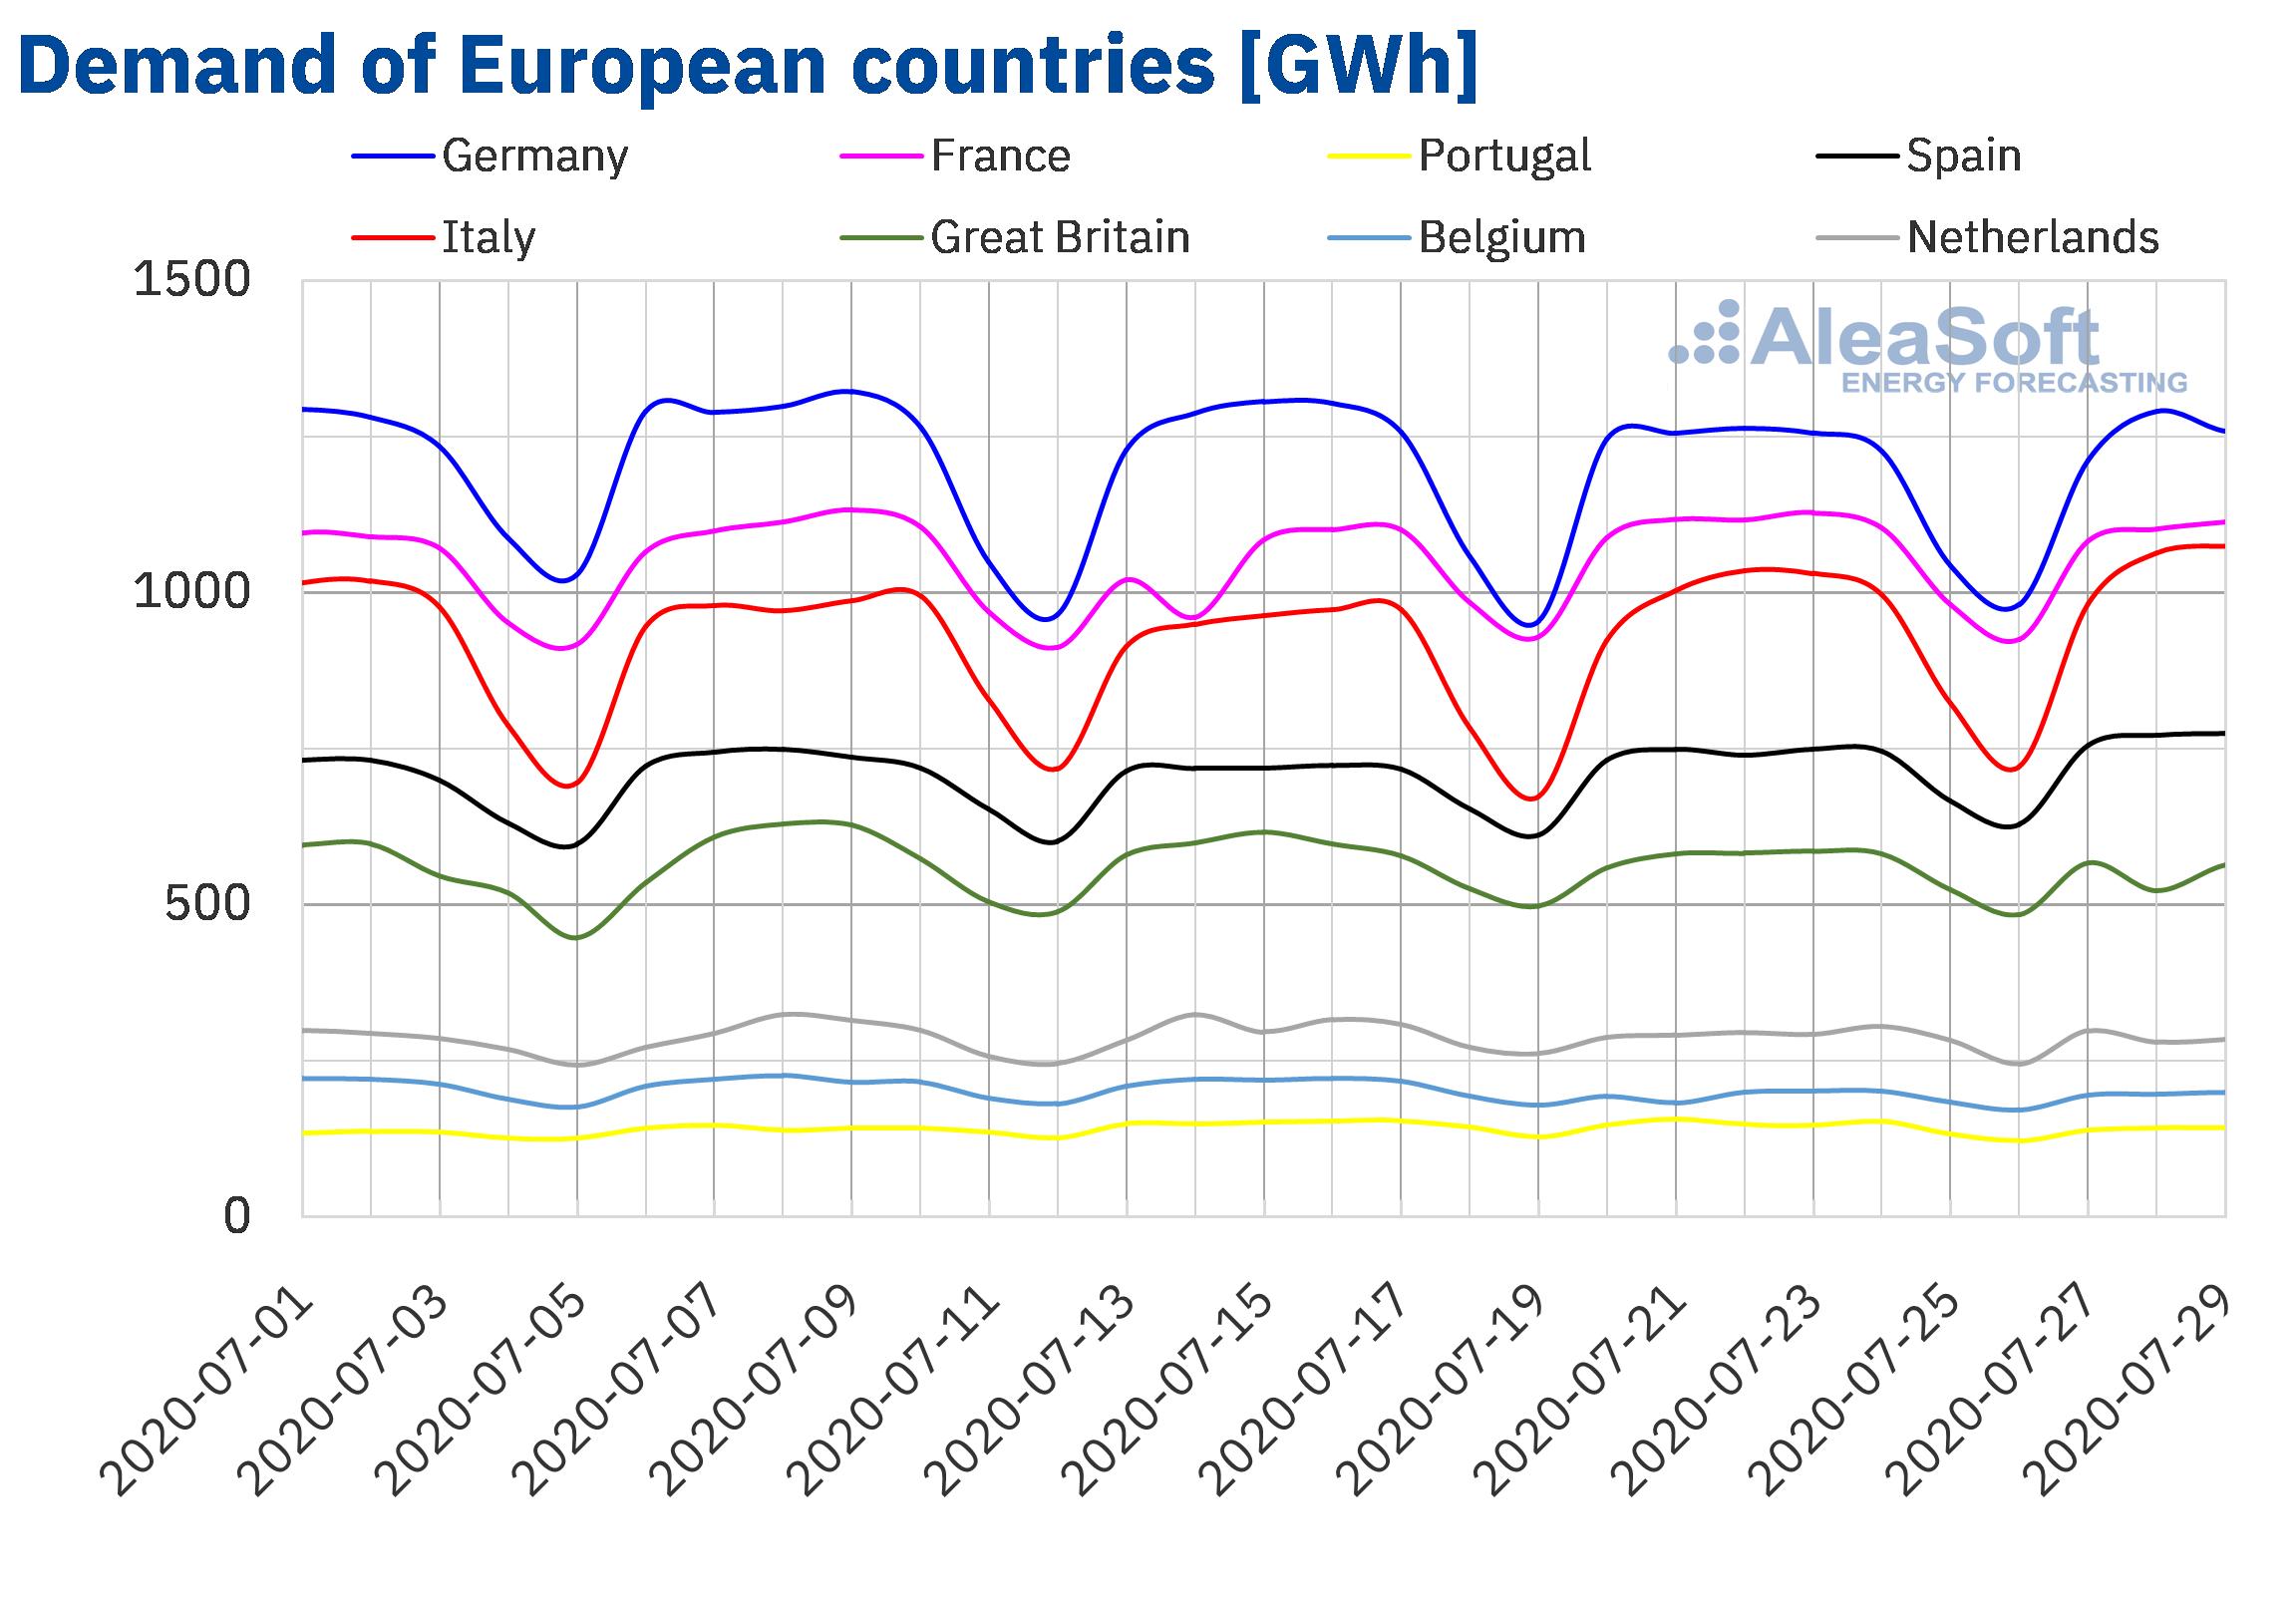 AleaSoft - Electricity demand of European countries